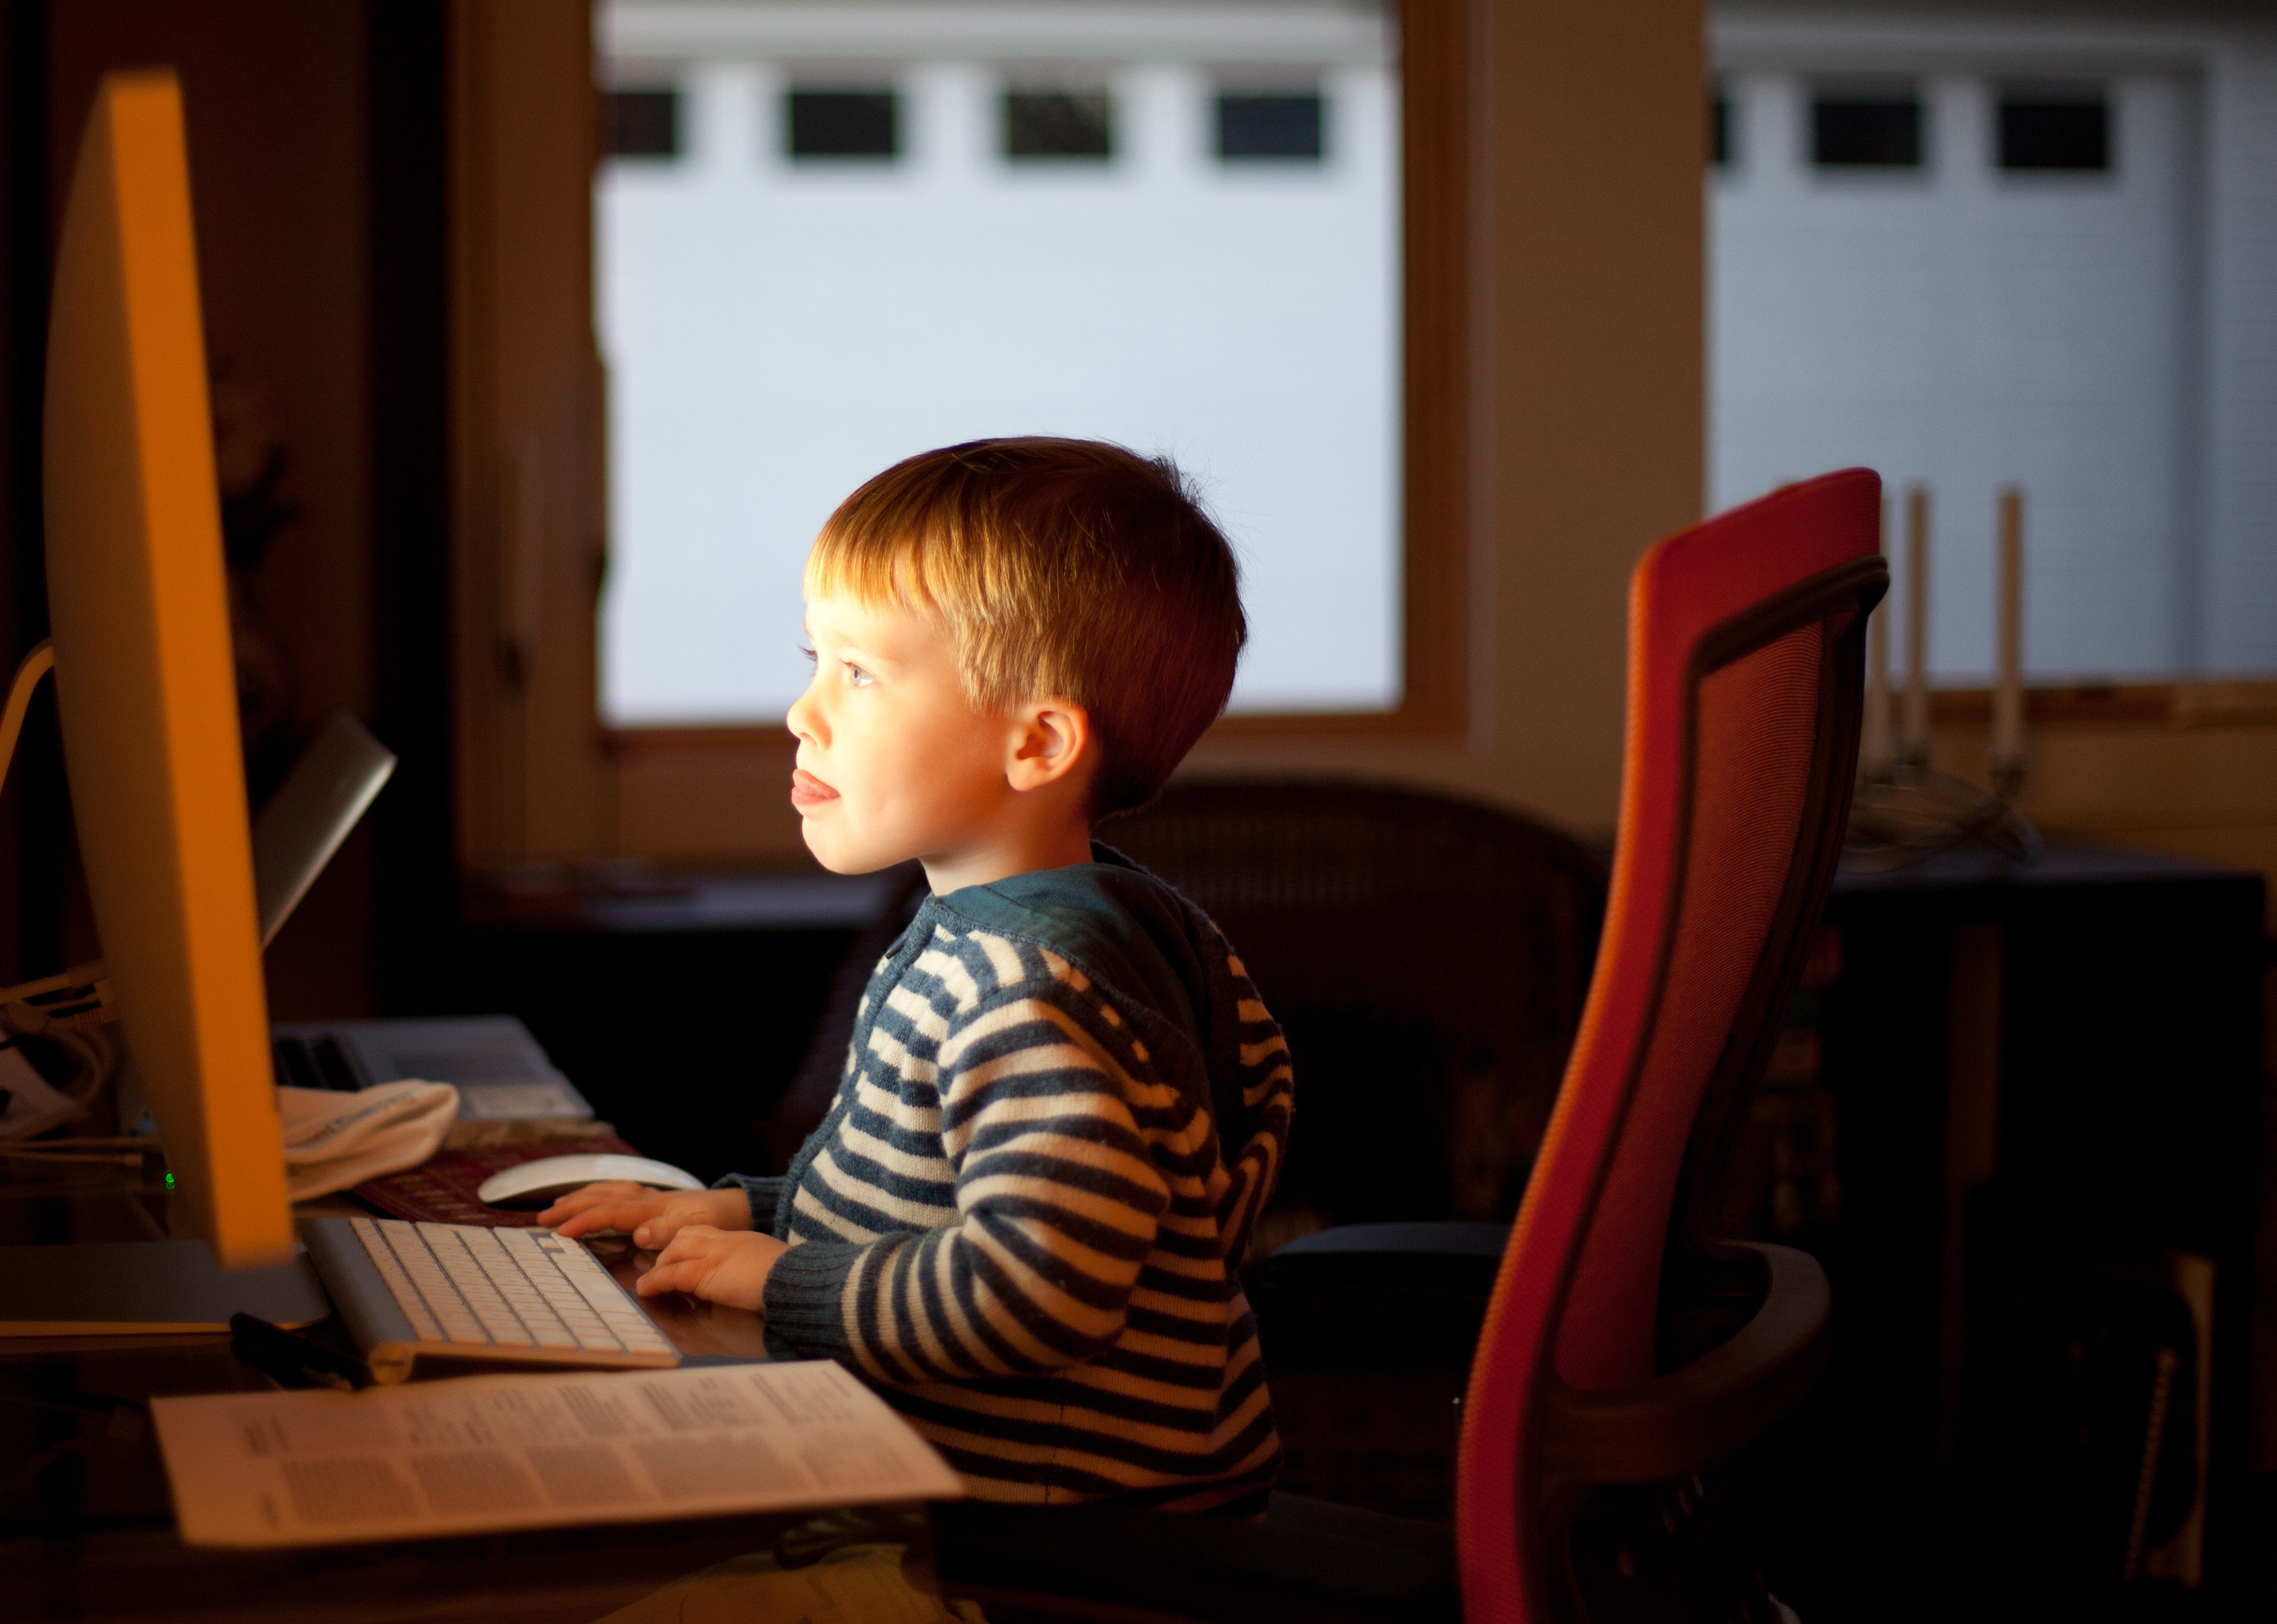 kid_on_computer